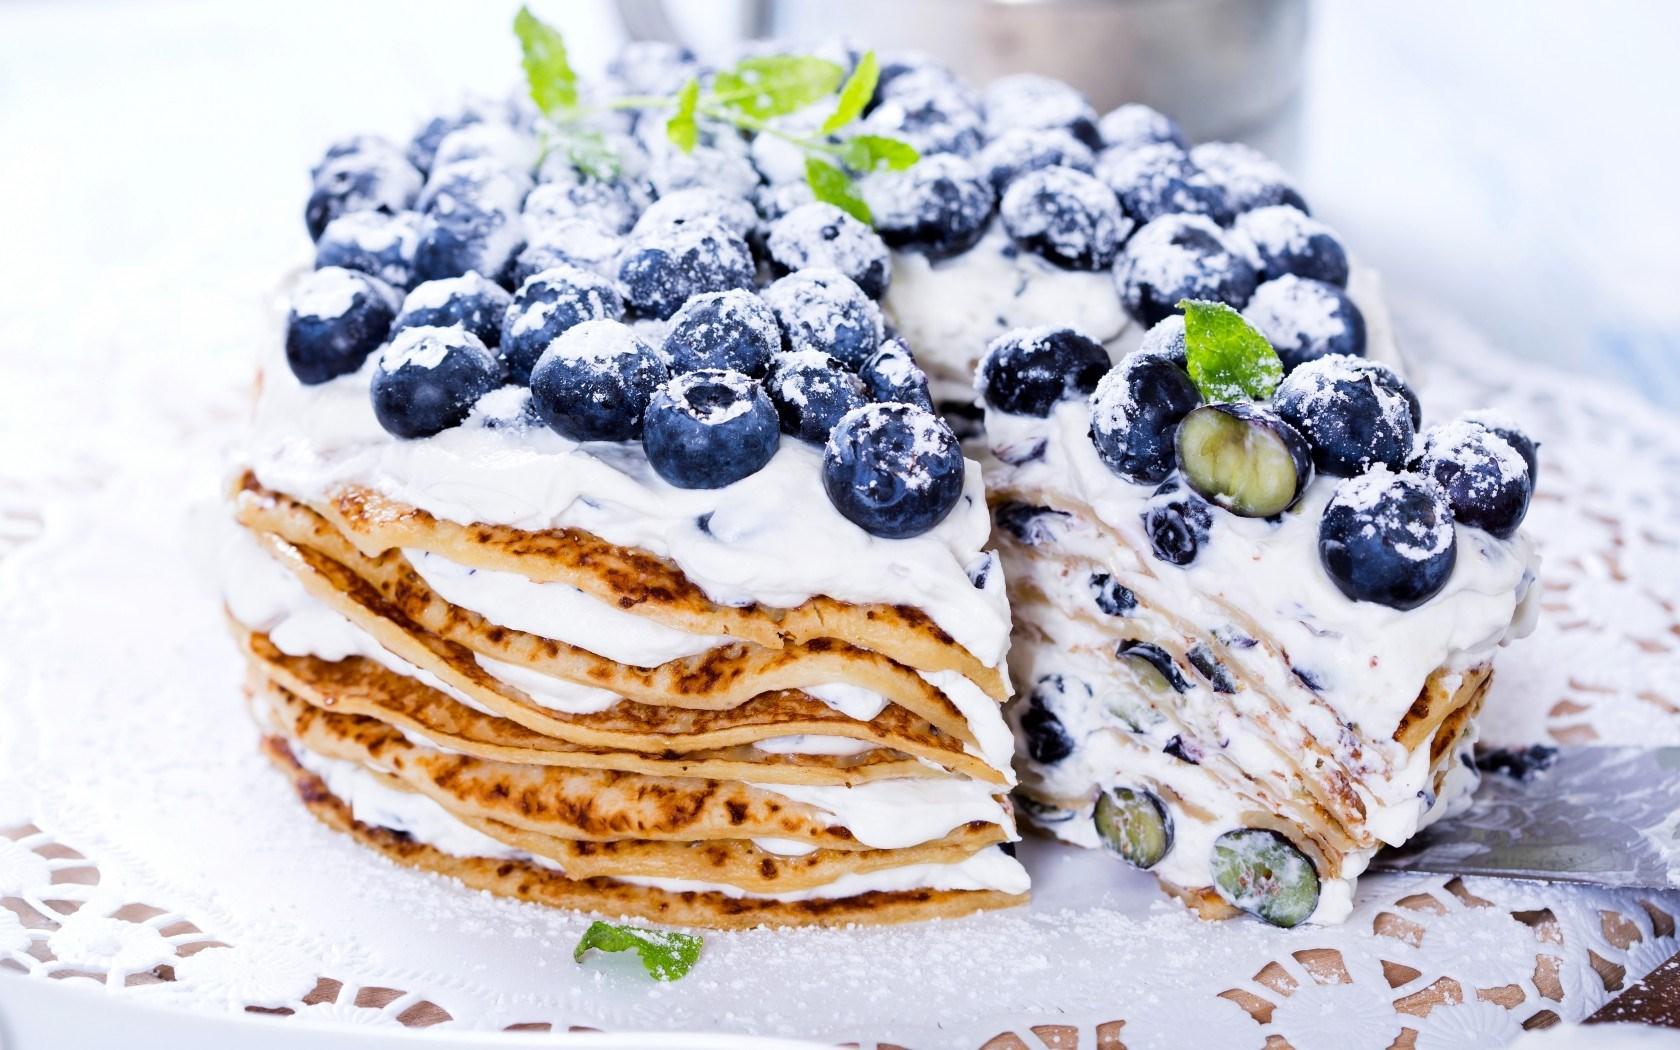 Pancakes Berries Blueberries Blueberry Cream Sweet Dessert